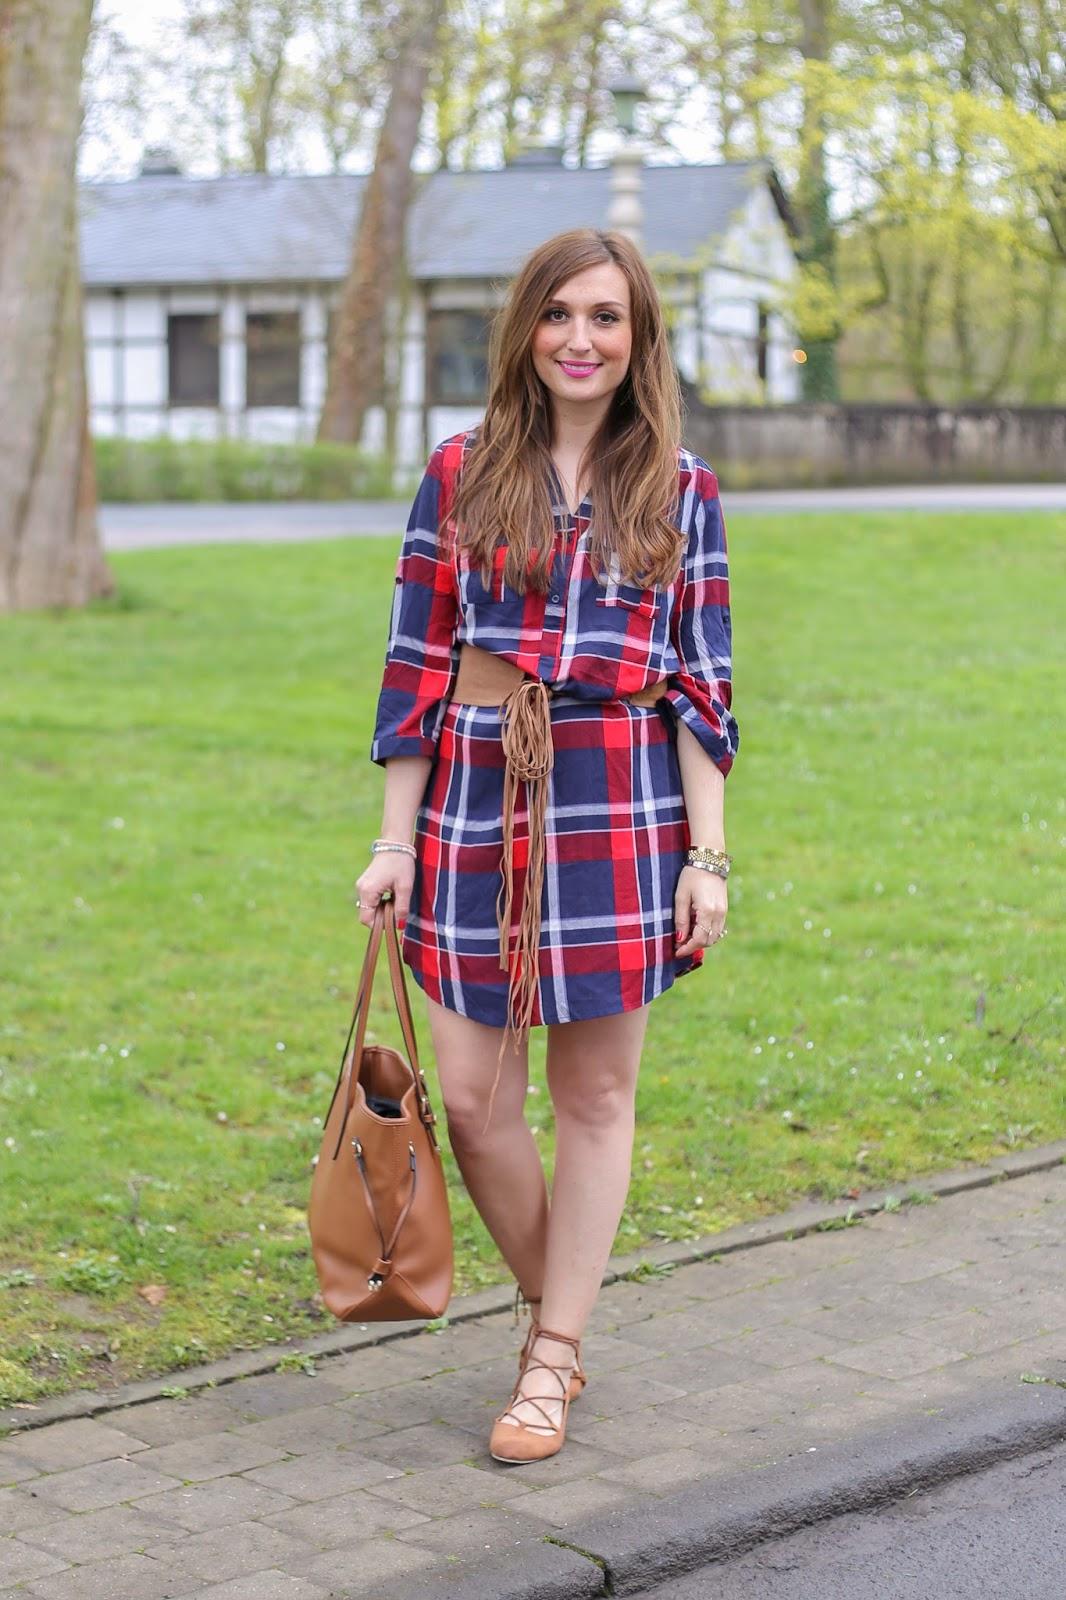 Just Fab Fashionstylebyjohanna - My Colloseum - Colloseum - Forever 18 -  Fashionblogger aus Deutschland - Deutsche Fashionblogger - Modeblogger aus Deutschland